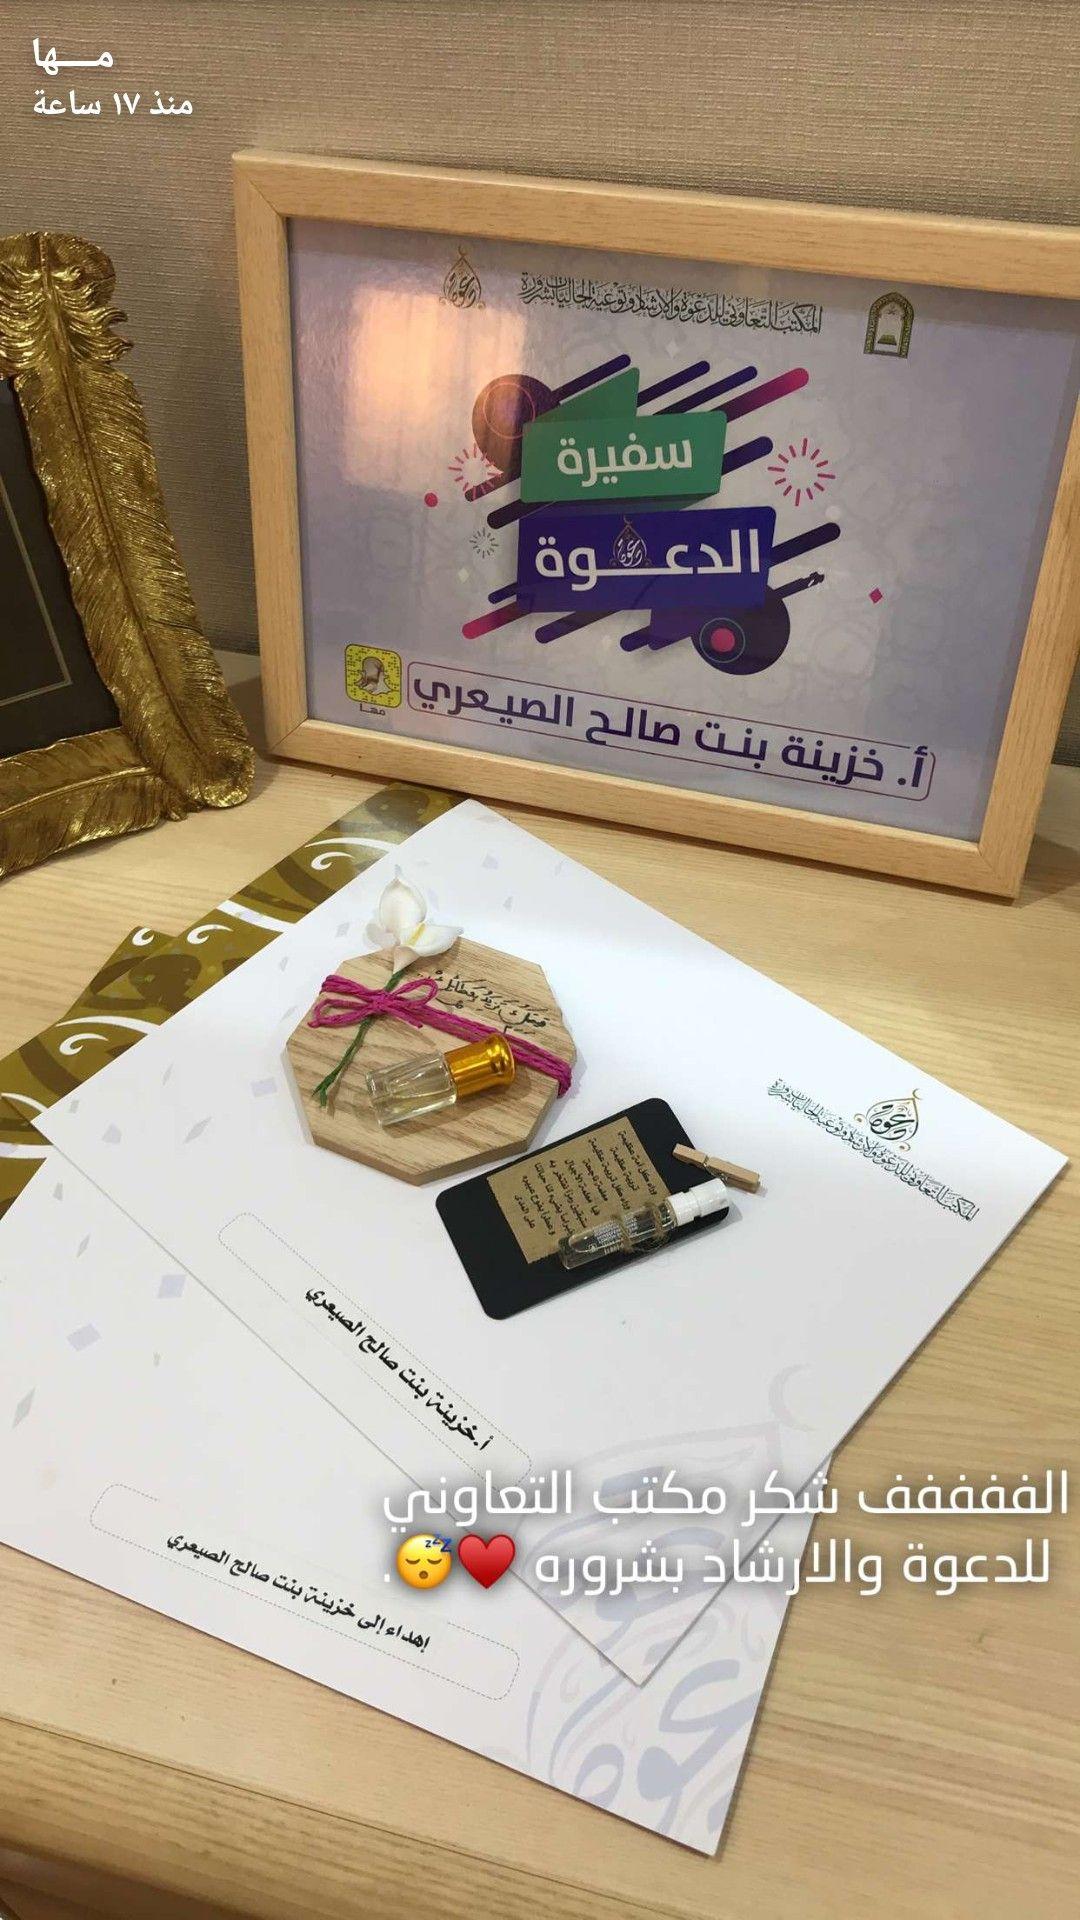 Pin By وهم On أشياء جميله Decor Home Decor Frame